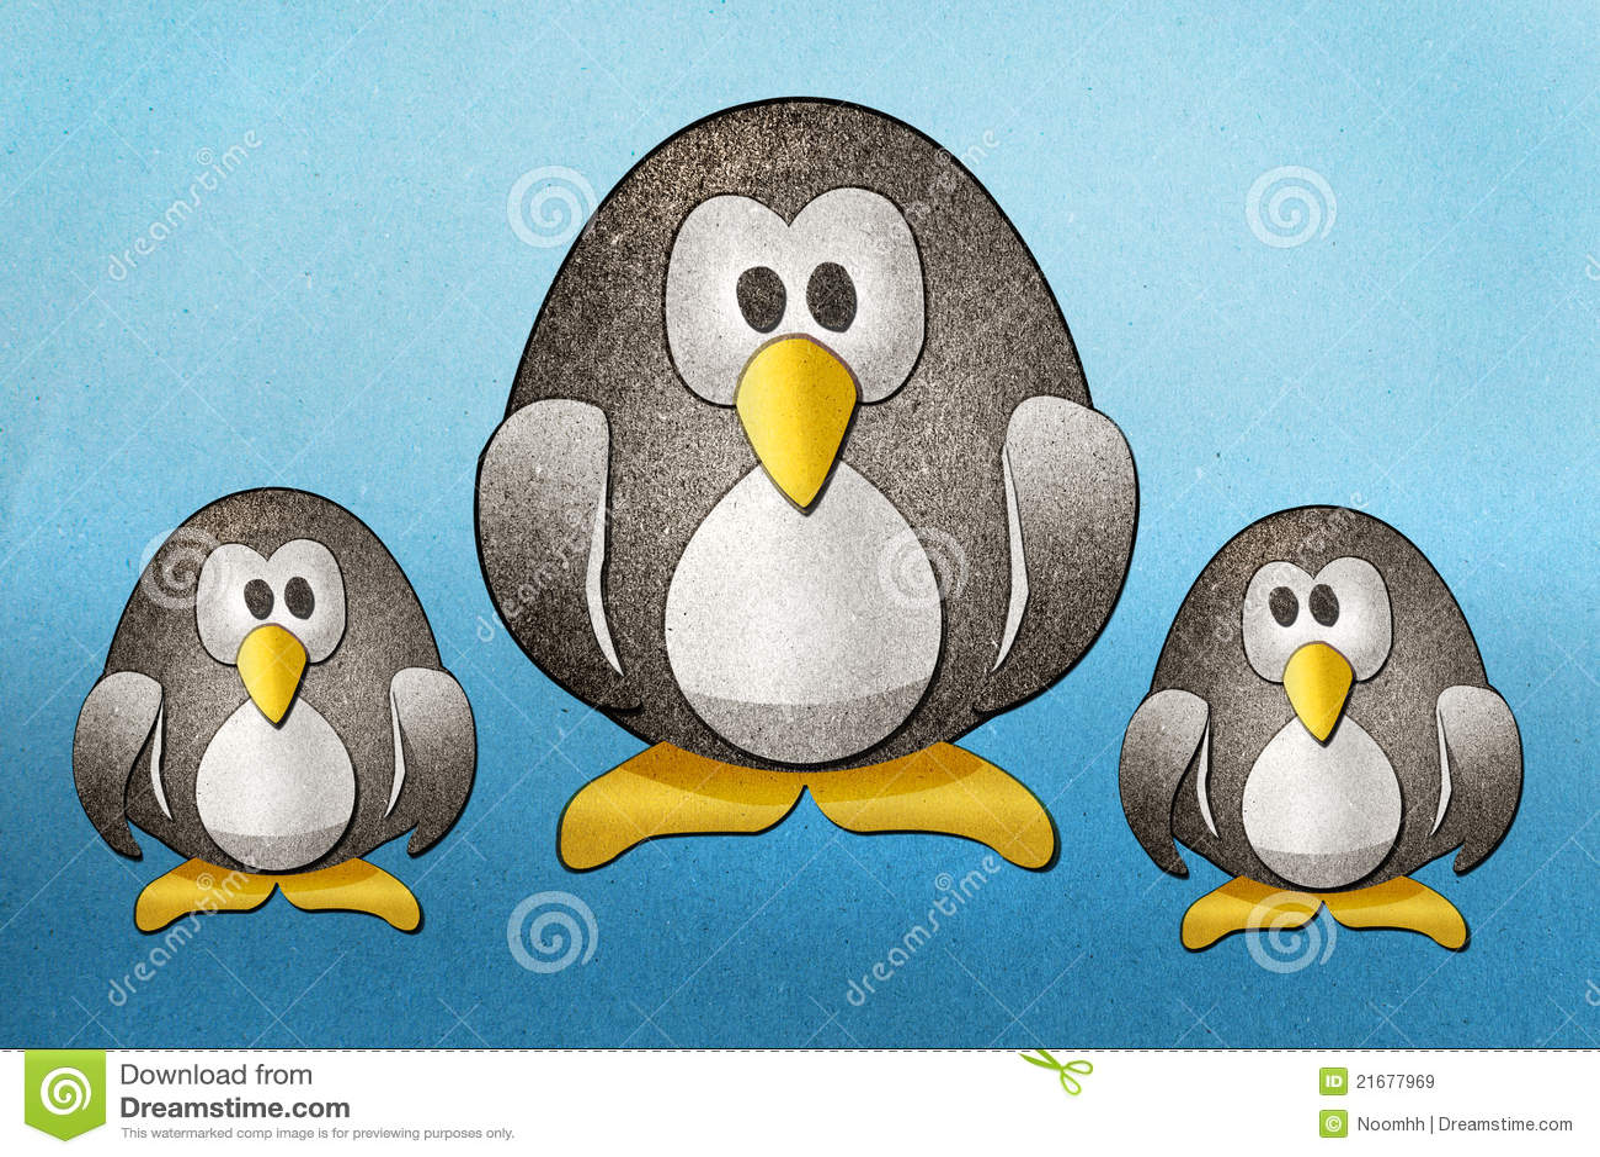 on penguins essay on penguins